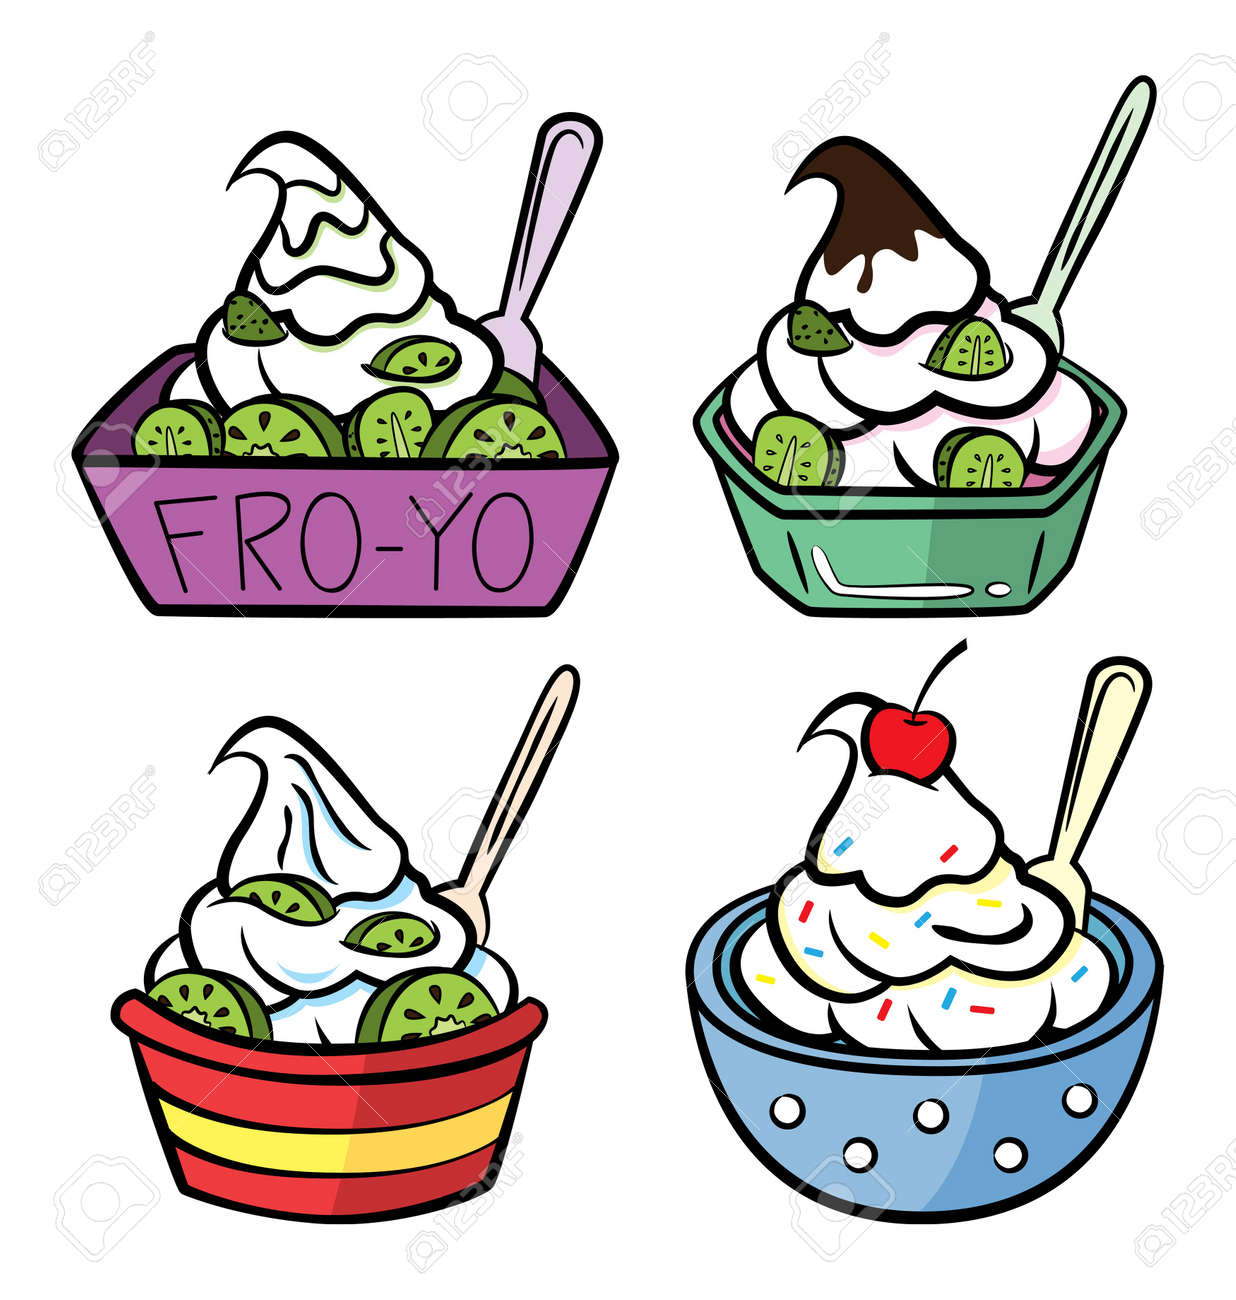 a cup of frozen yogurt royalty free cliparts vectors and stock rh 123rf com